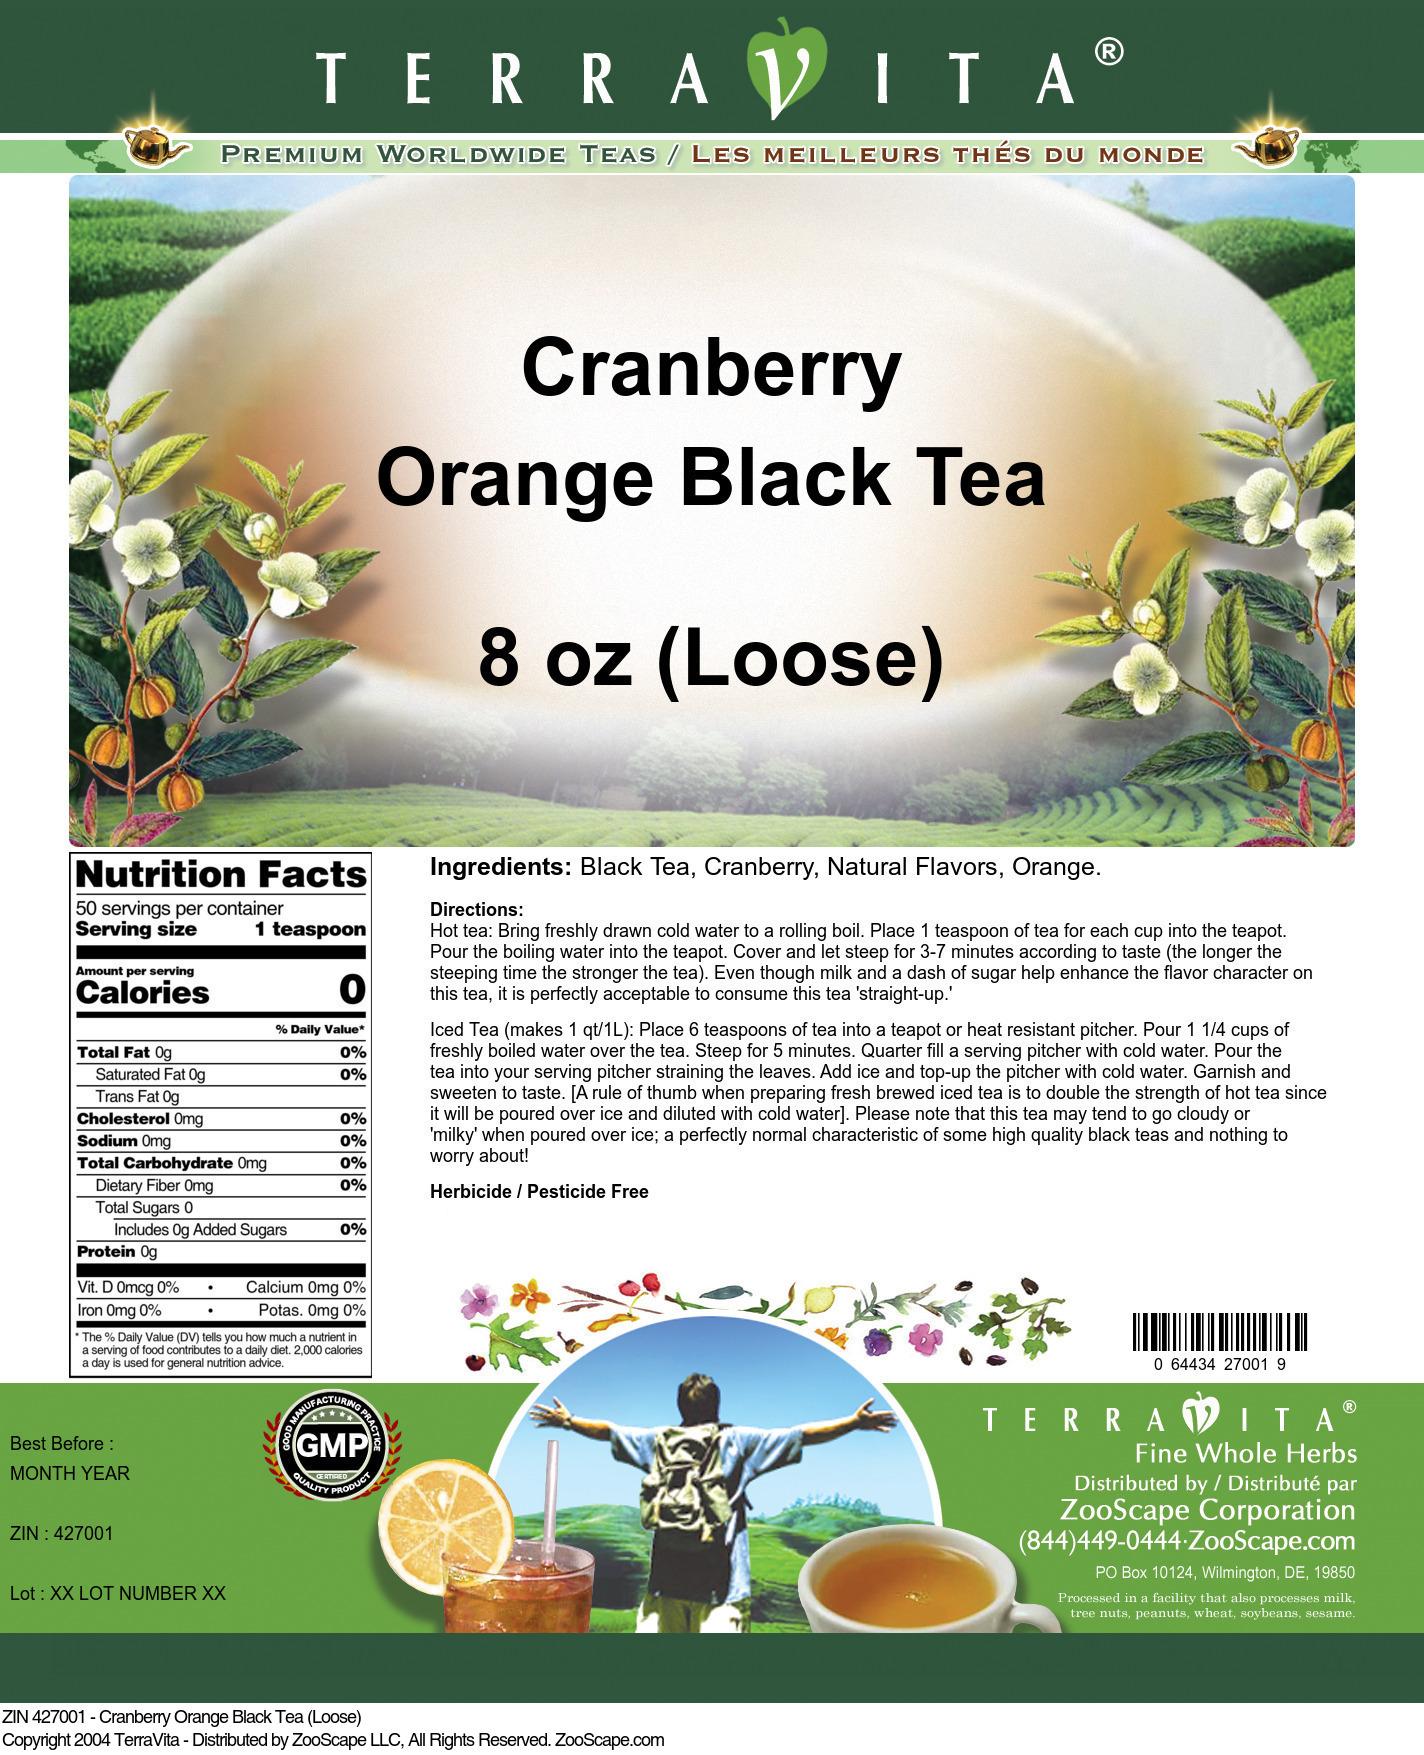 Cranberry Orange Black Tea (Loose)